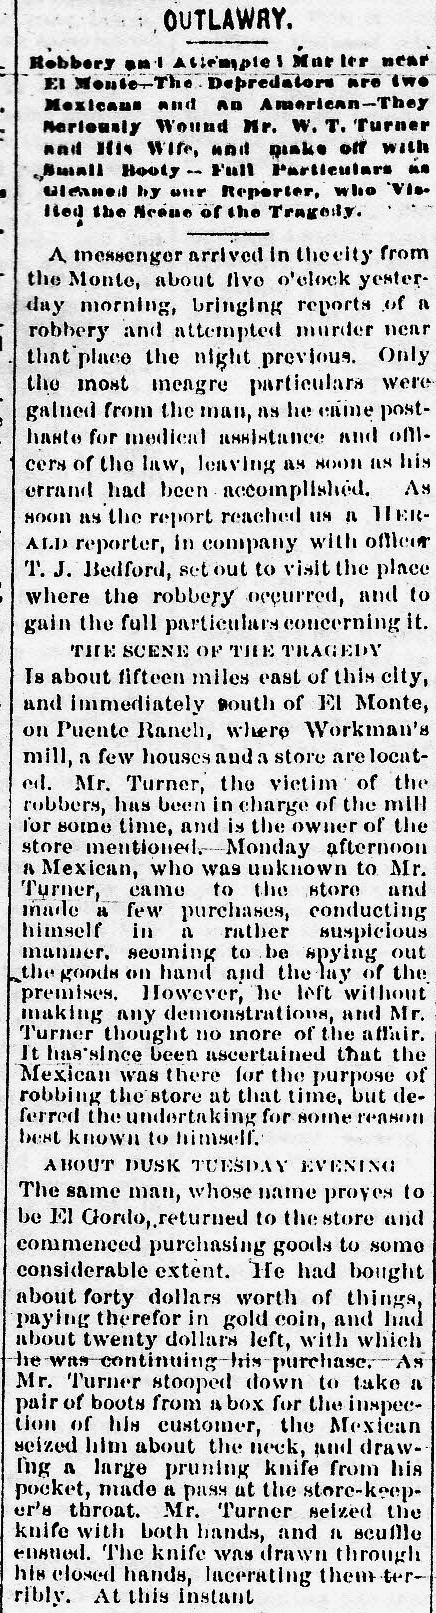 Workman Mill store Herald 4Jun74